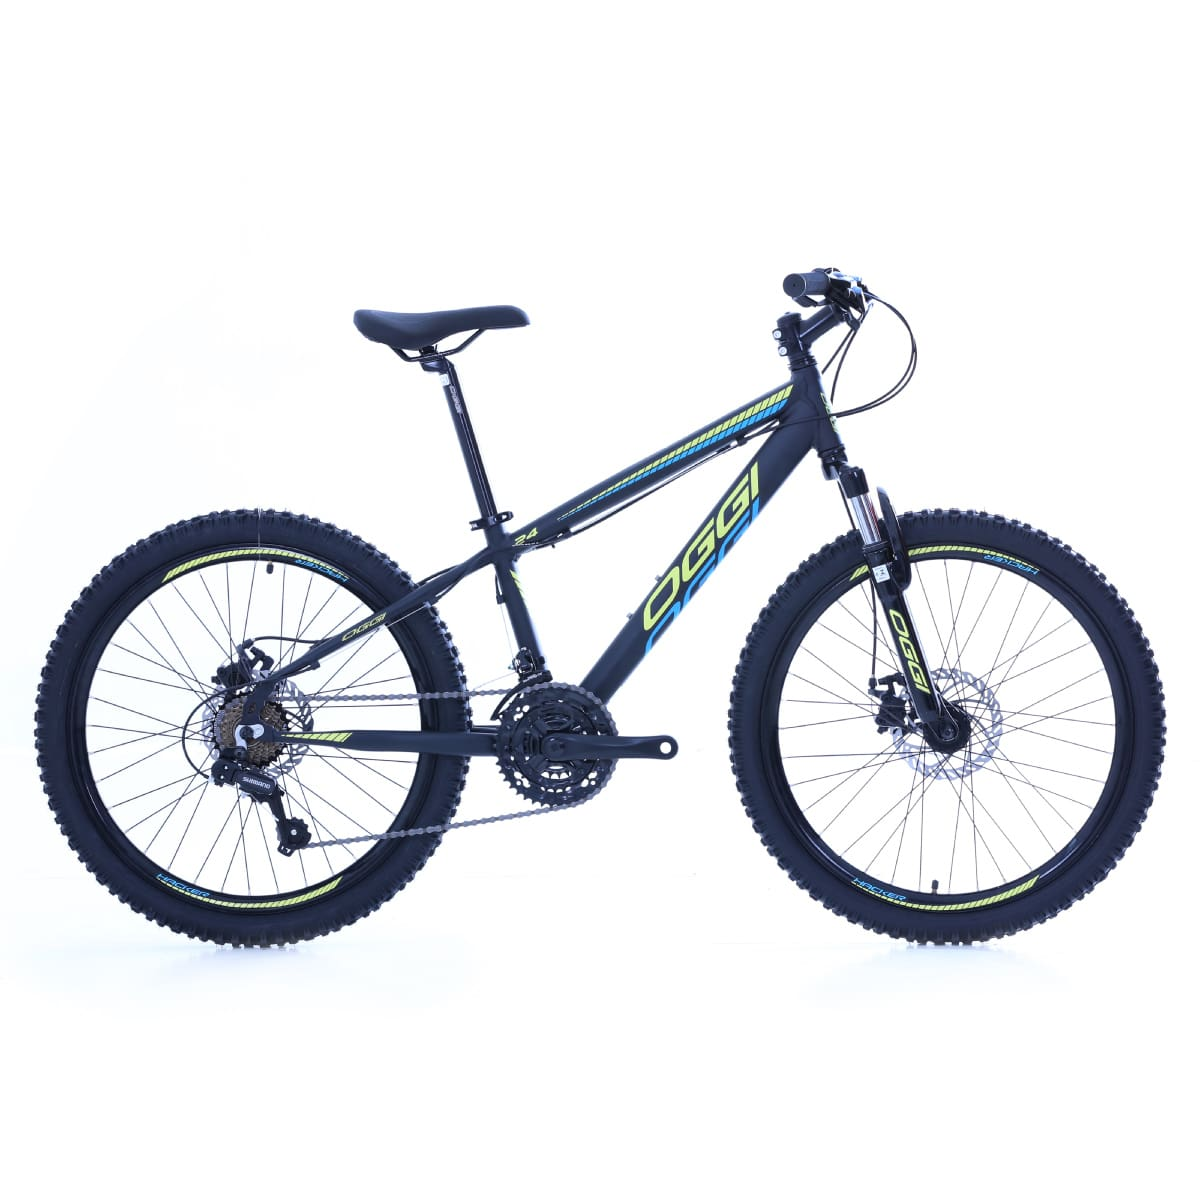 Bike Infantil Oggi Hacker Aro 24 2020 21v Freio a Disco Shimano